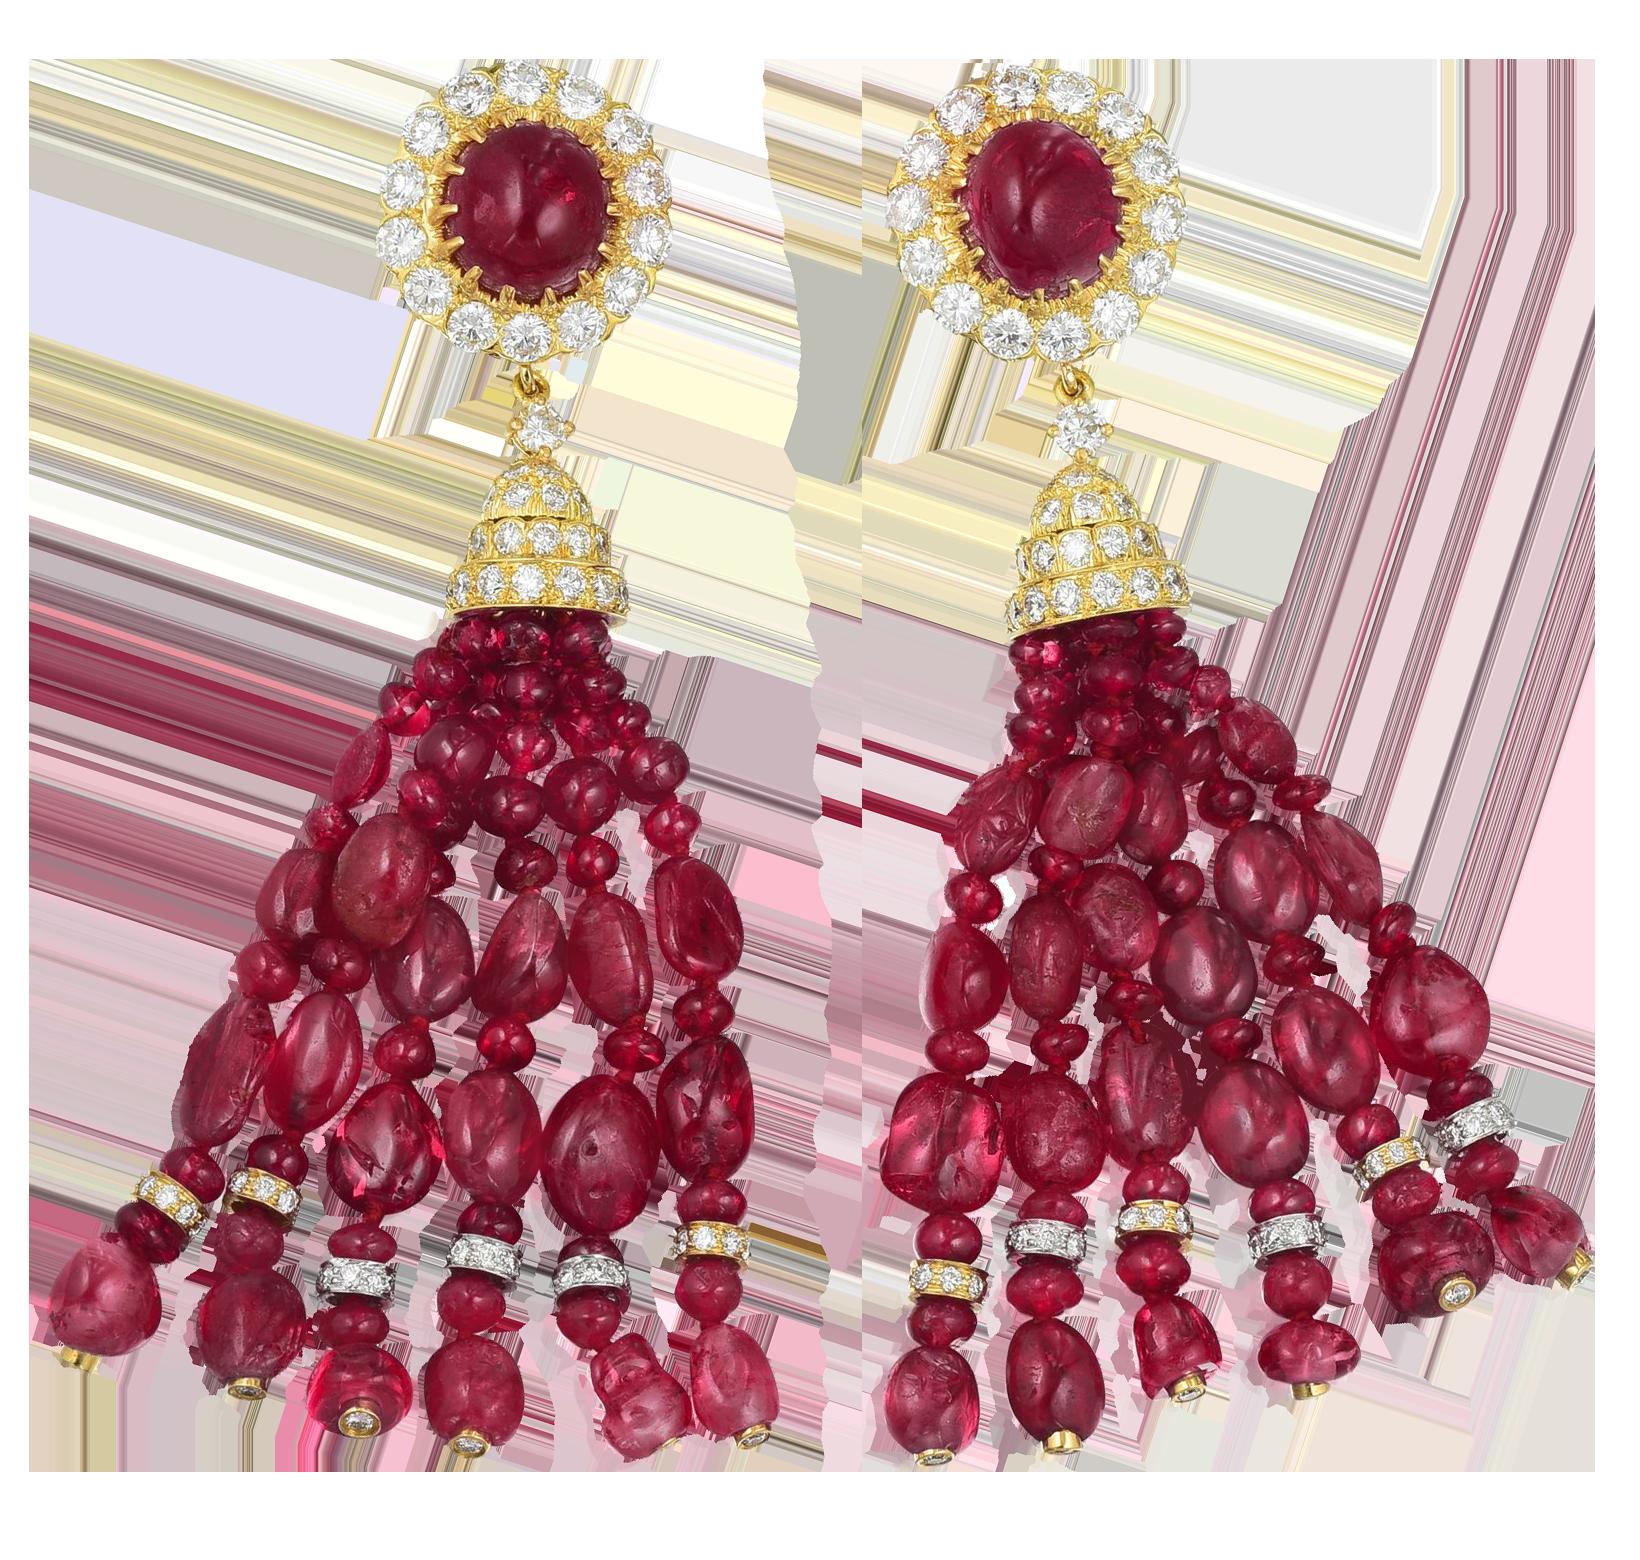 ruby-and-diamond-tassel-earrings-david-webb-fe7e